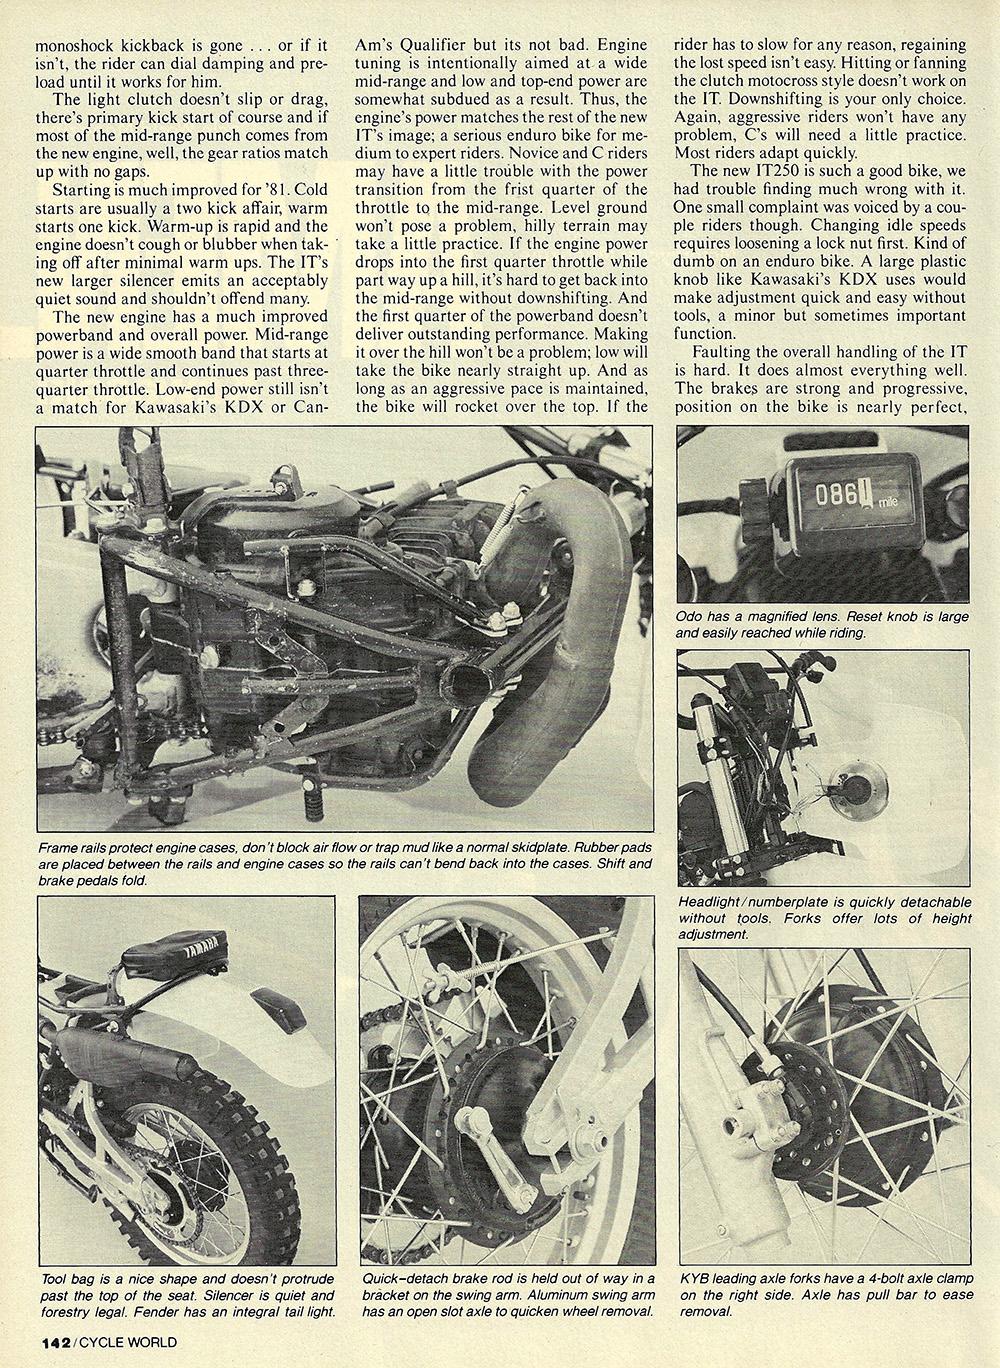 1981 Yamaha IT250H road test 05.jpg